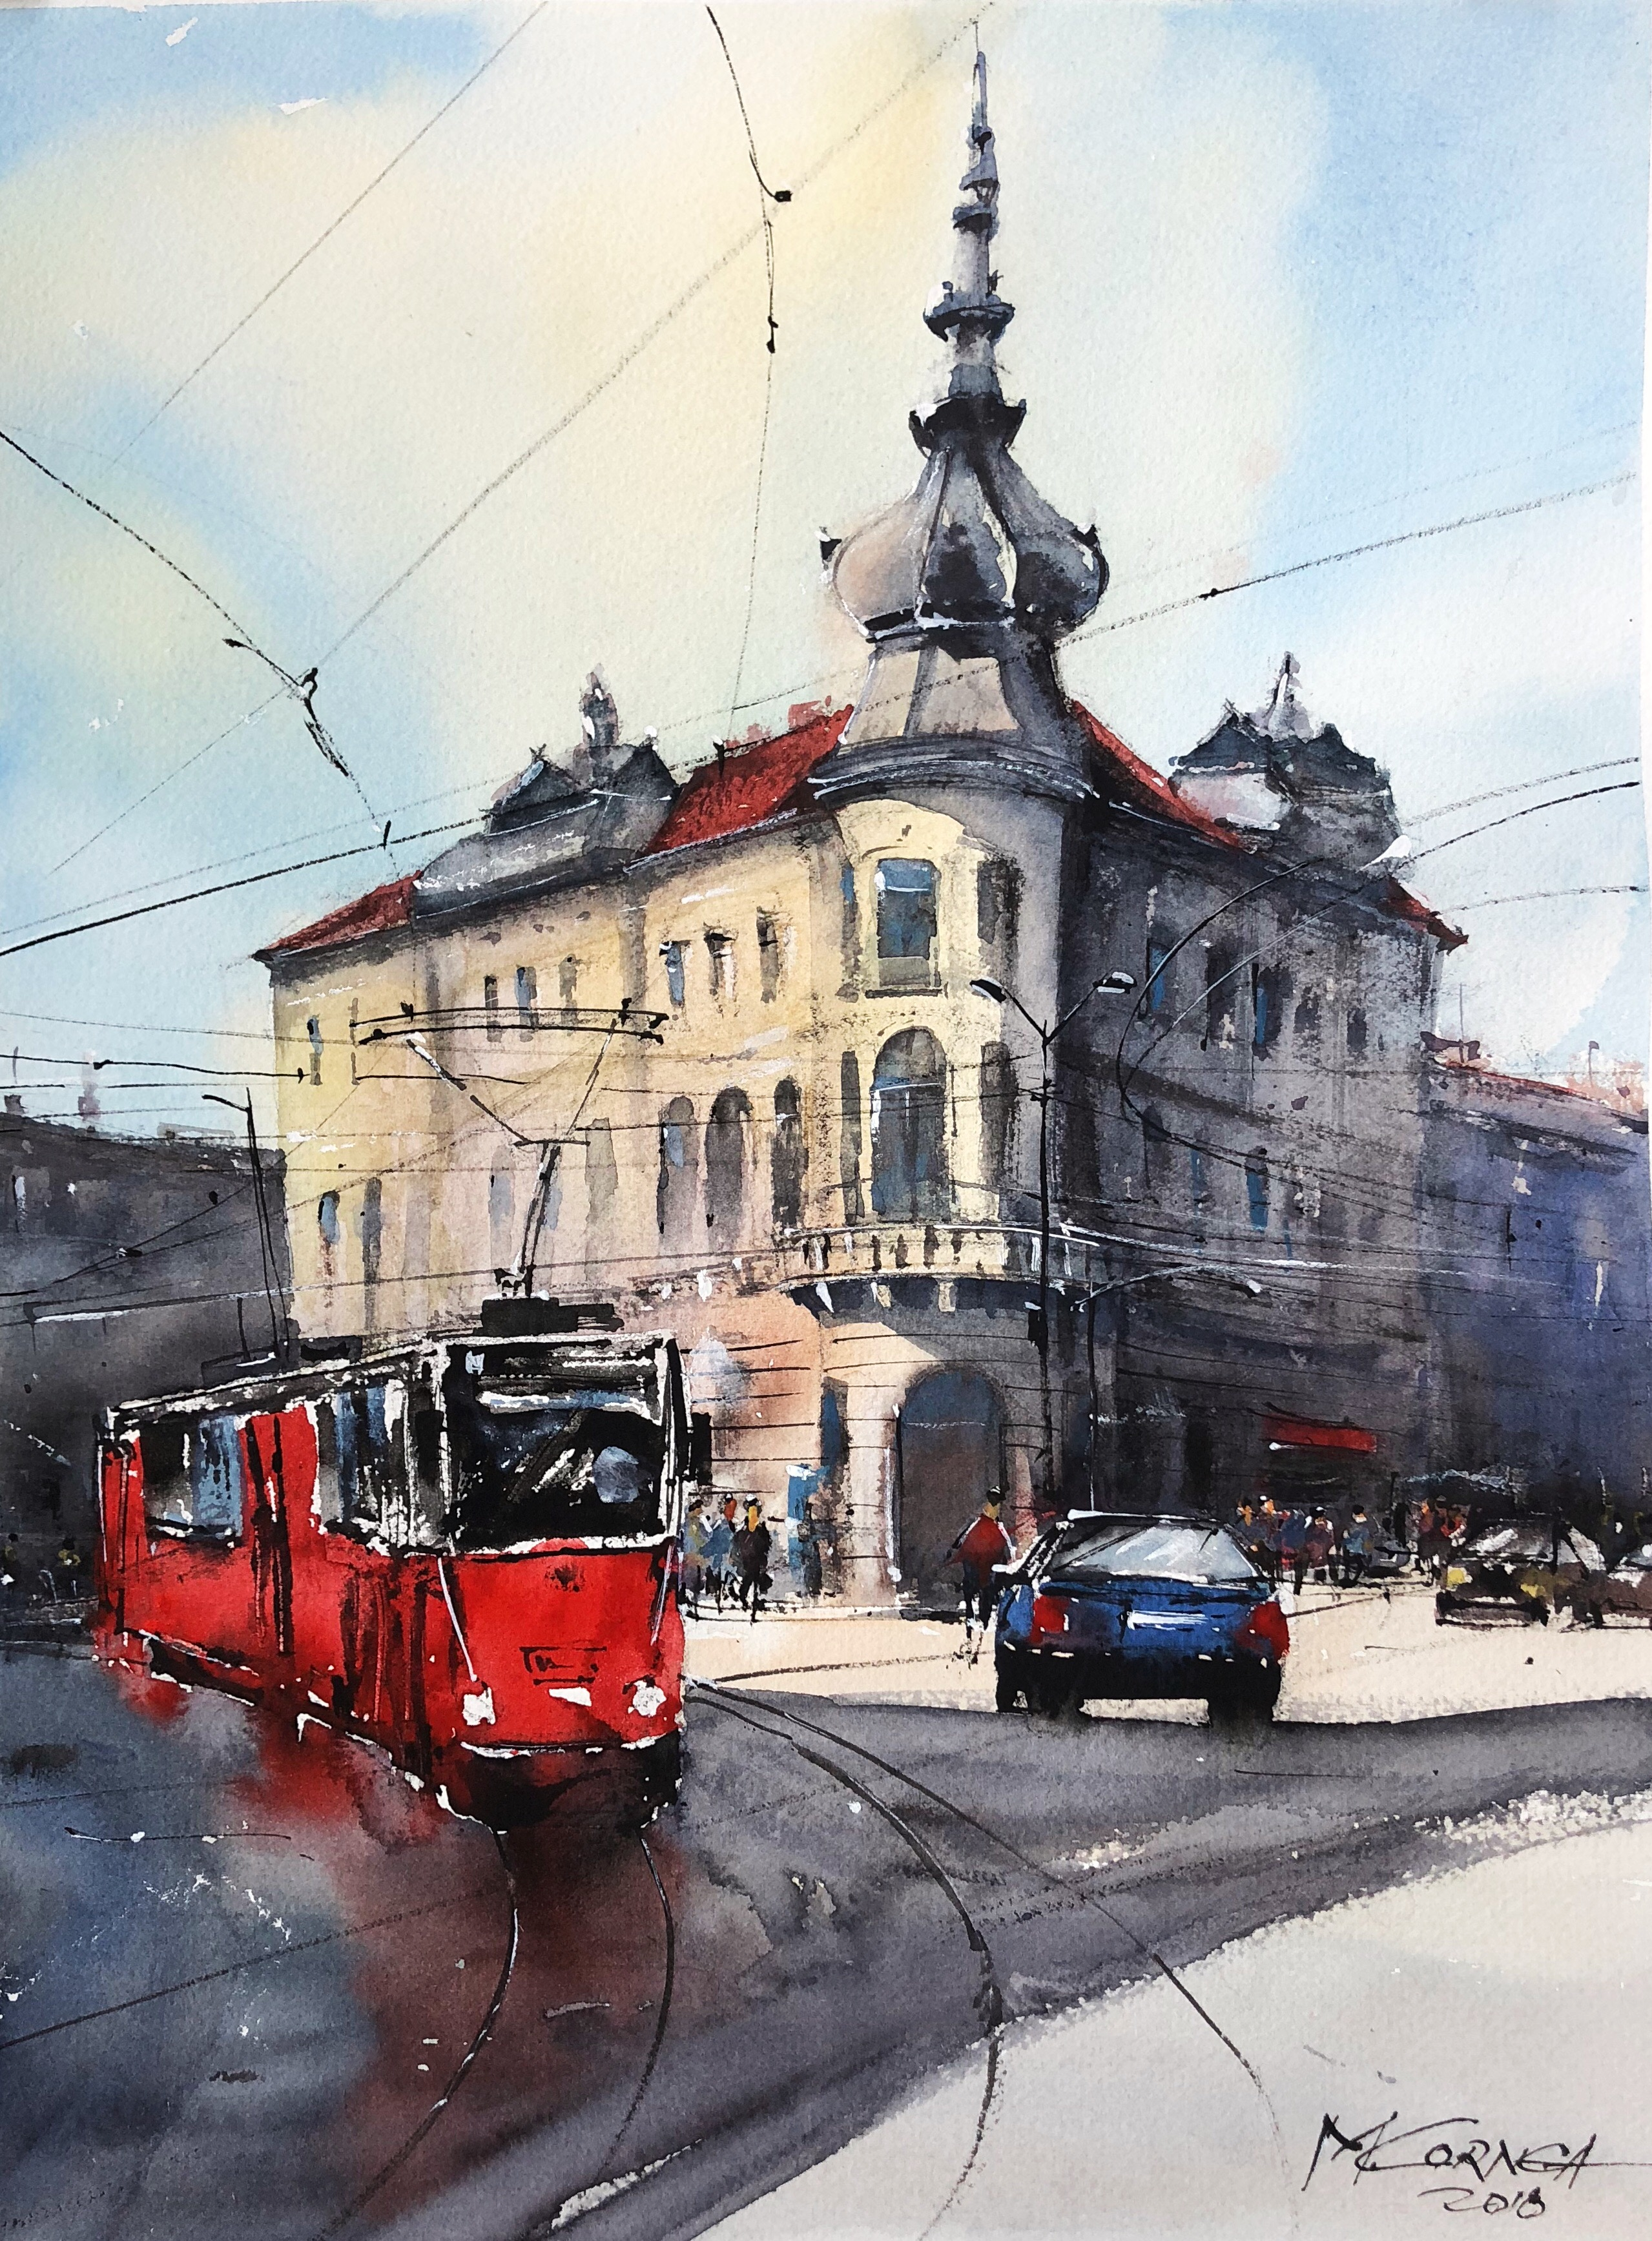 https://mariazinca.com/wp-content/uploads/2019/03/Palatul-Babos-Cluj-30x40cm.jpg